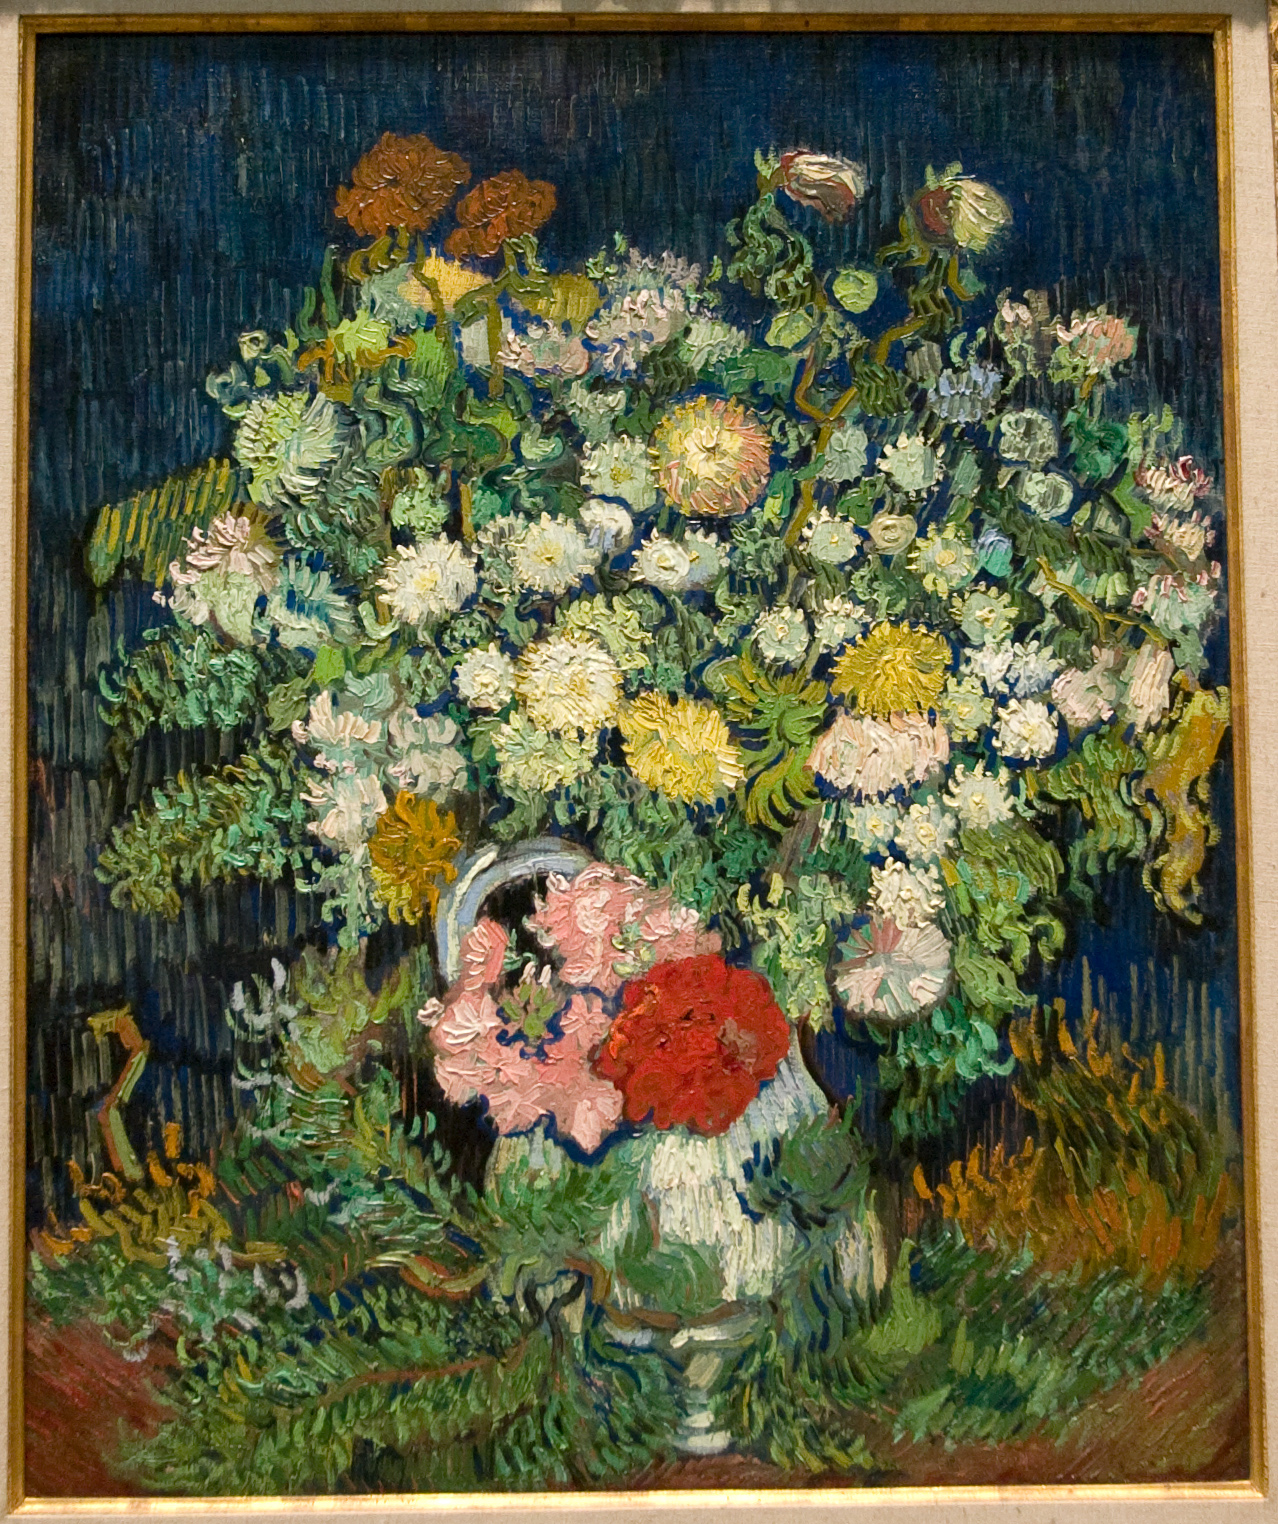 Bouquet of Flowers in a Vase, Van Gogh